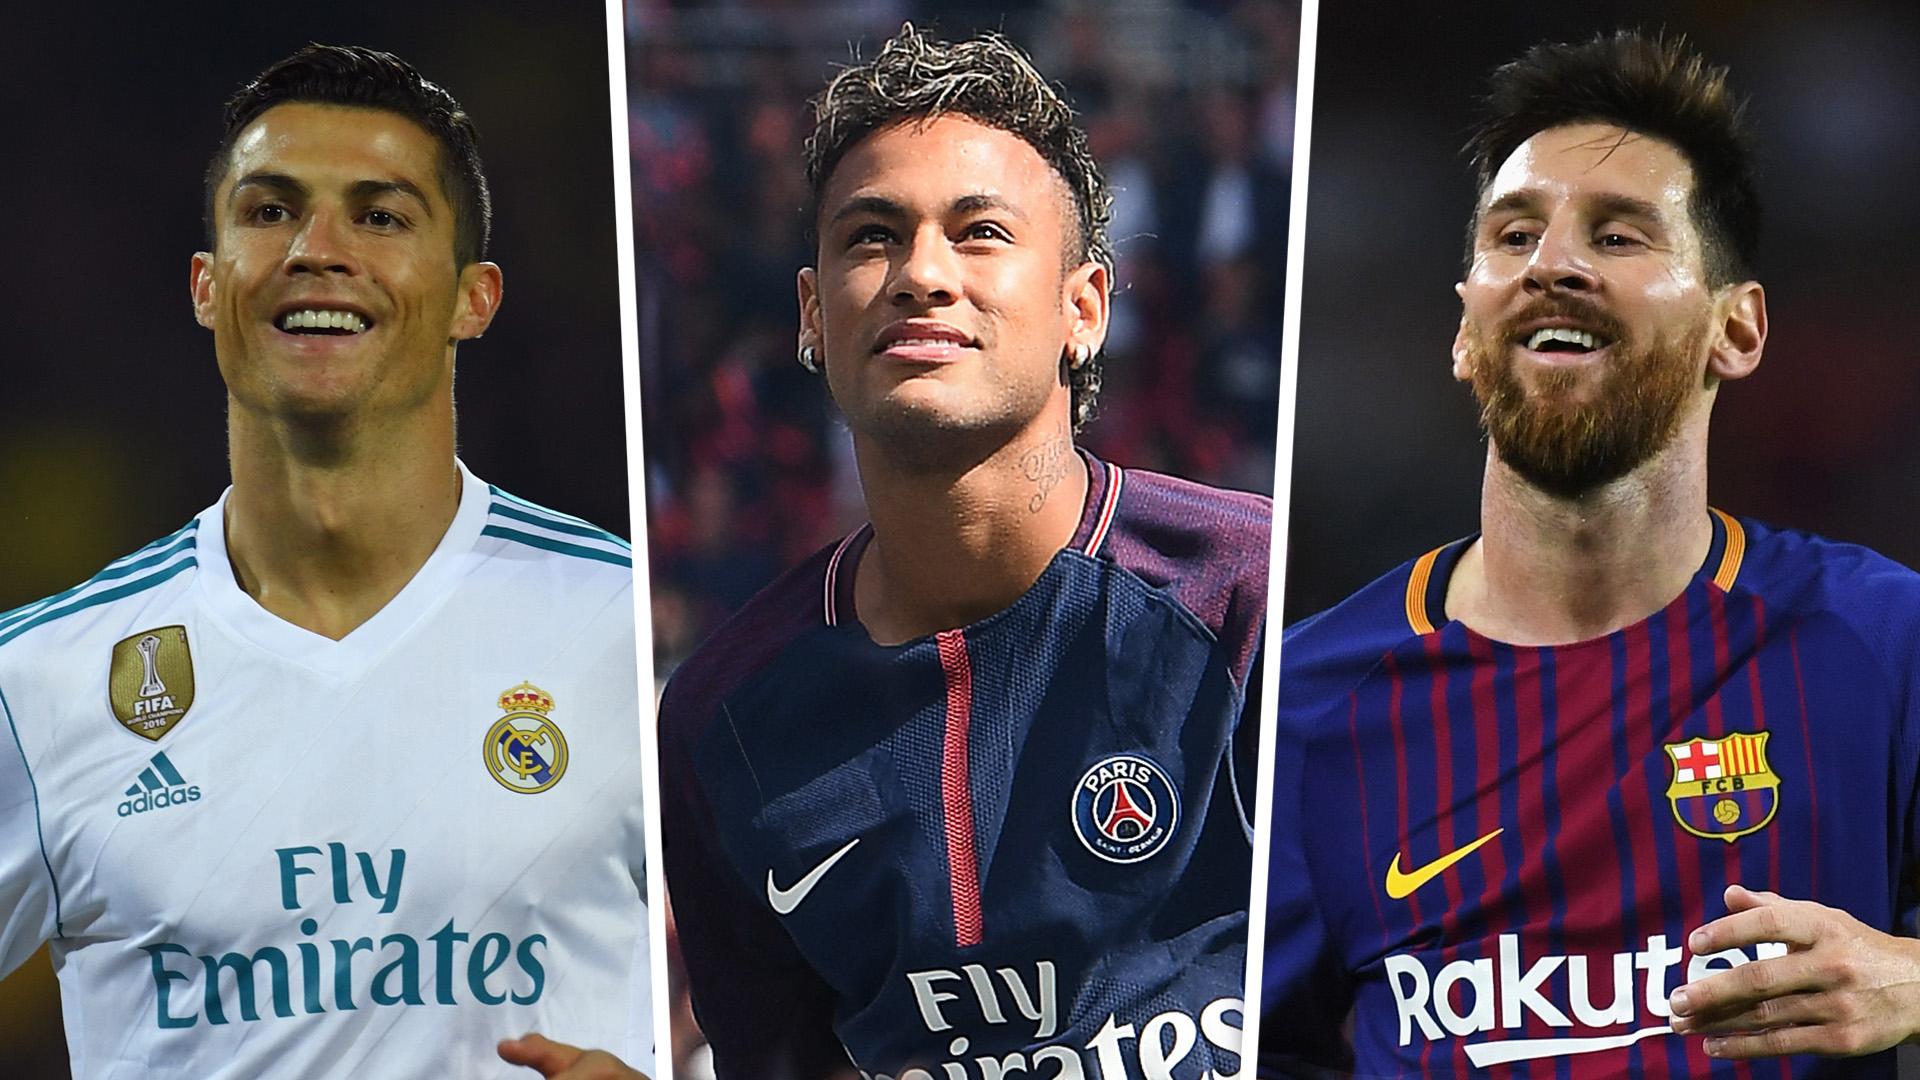 Ronaldo-neymar-messi-gfx_j604w84vfouv1jdjh44hscpd9